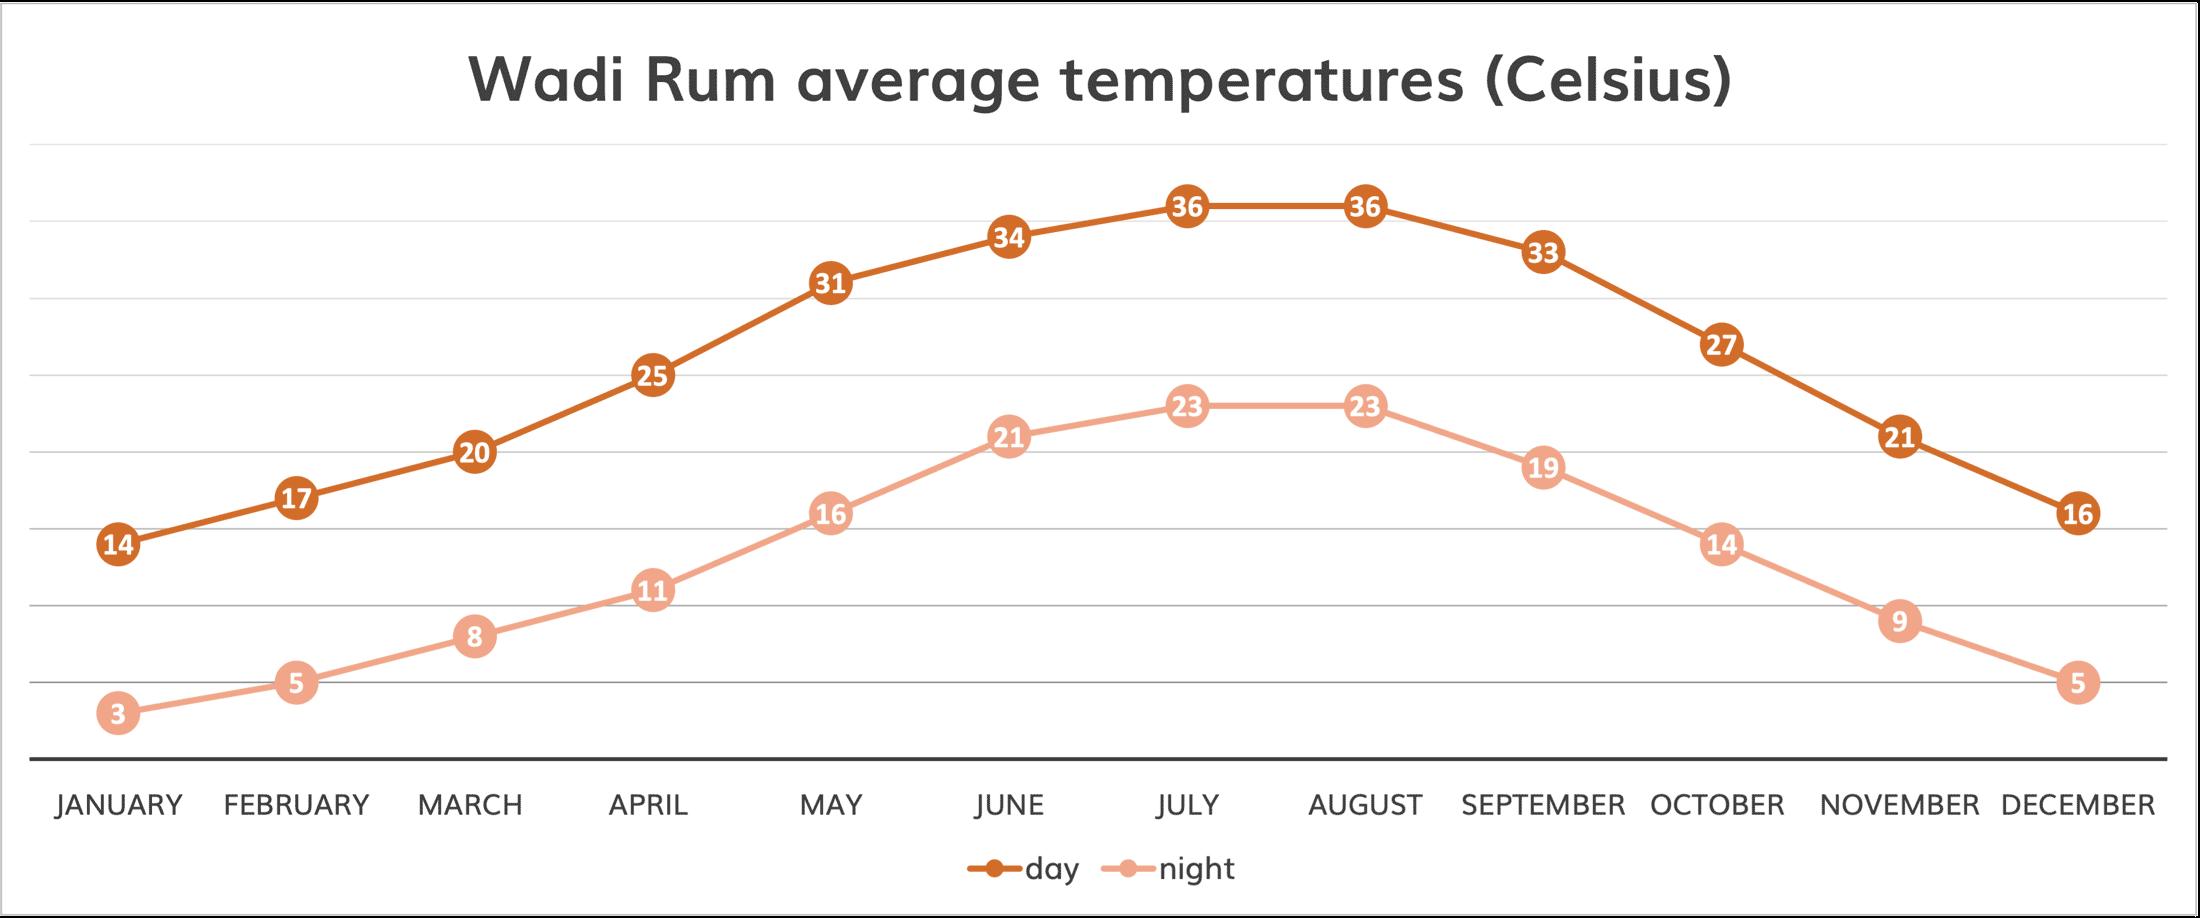 wadi rum weather average temperatures chart